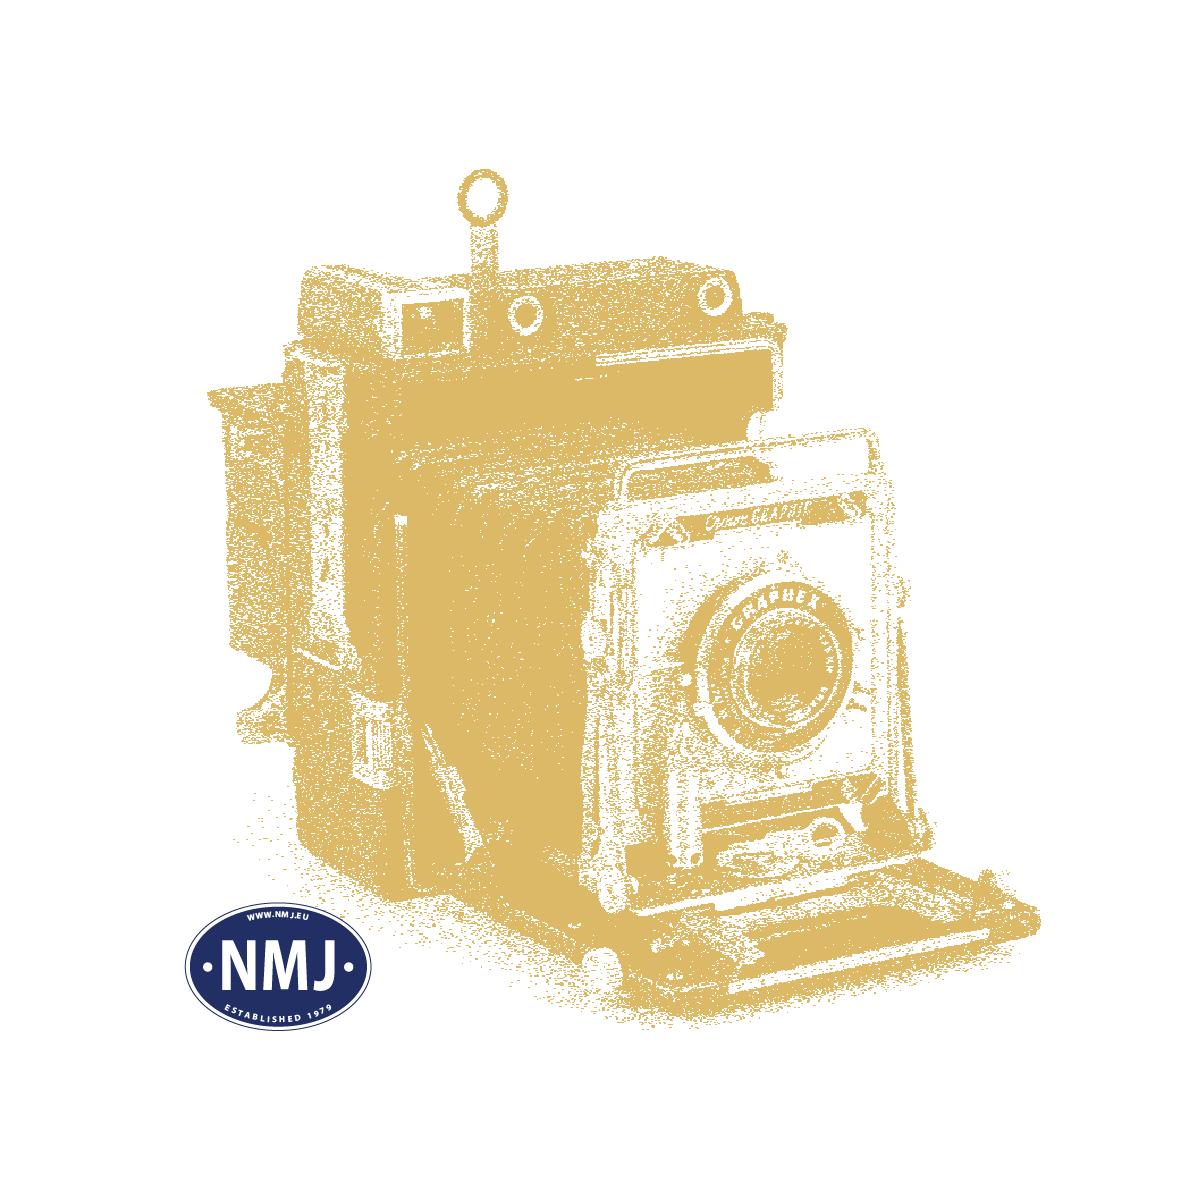 NMJT87.201AC - NMJ Topline NSB El11b.2148, rotbraun, AC, Digital